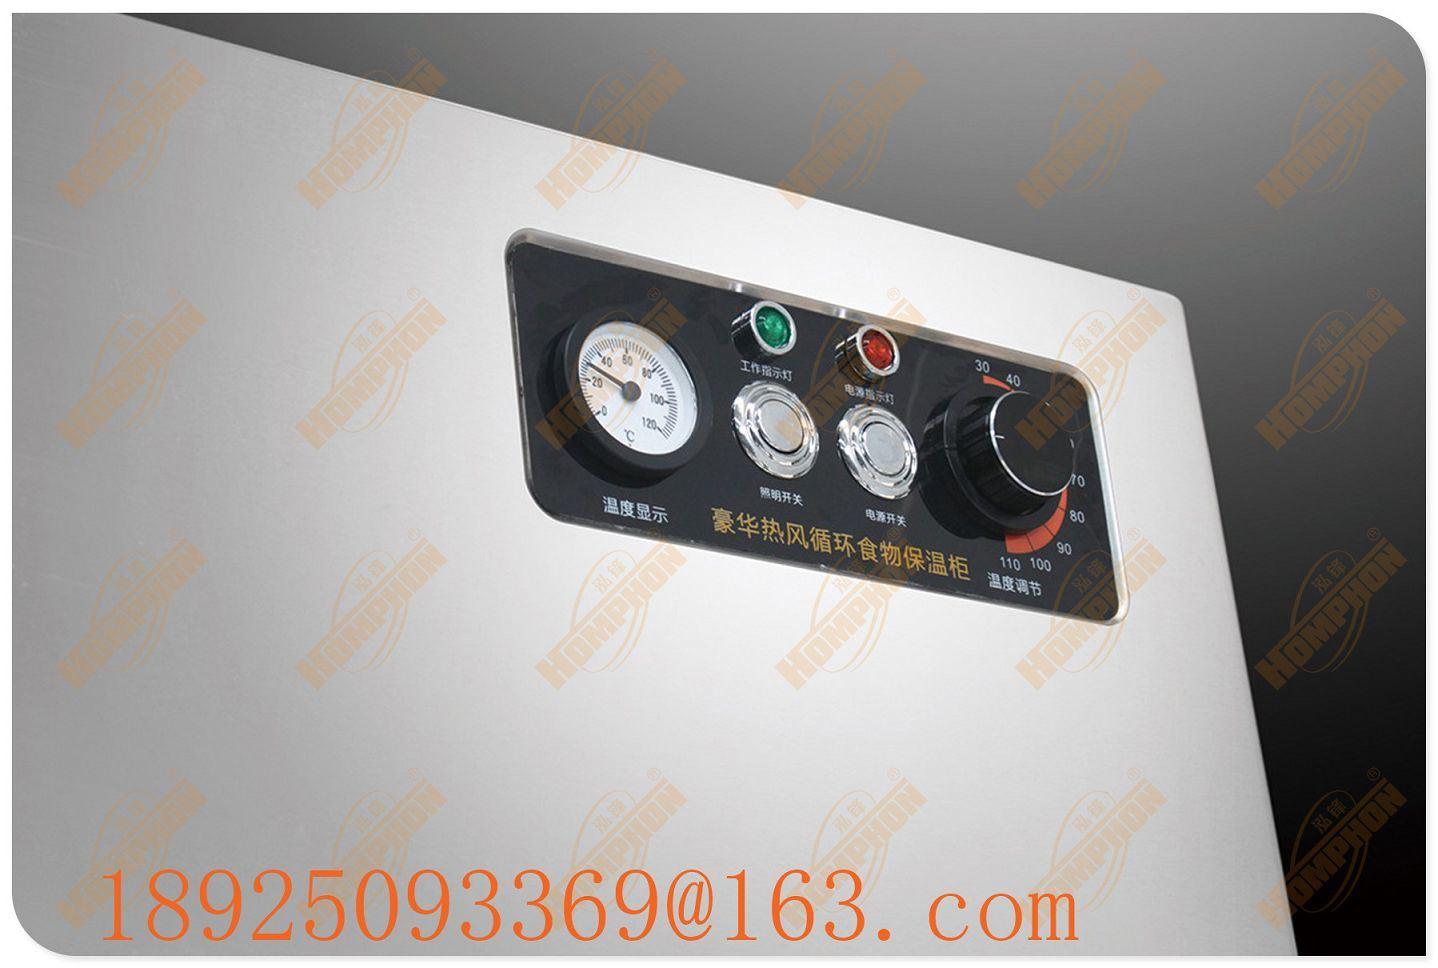 Single Door Food Warmer Cabinet (10W)